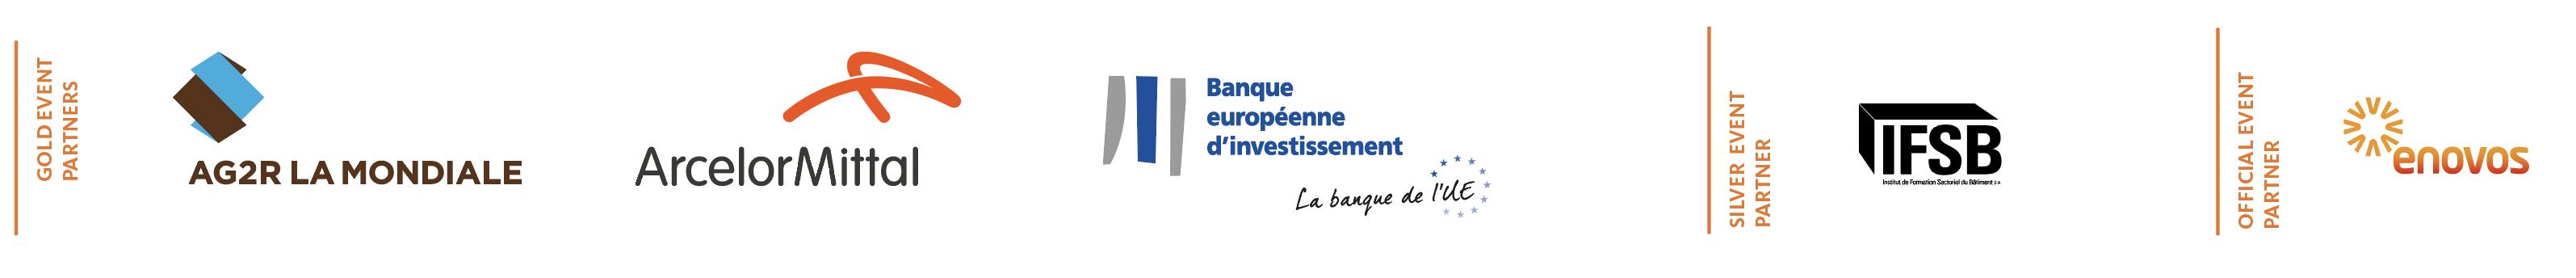 Les sponsors du Luxembourg Sustainability Forum 2021